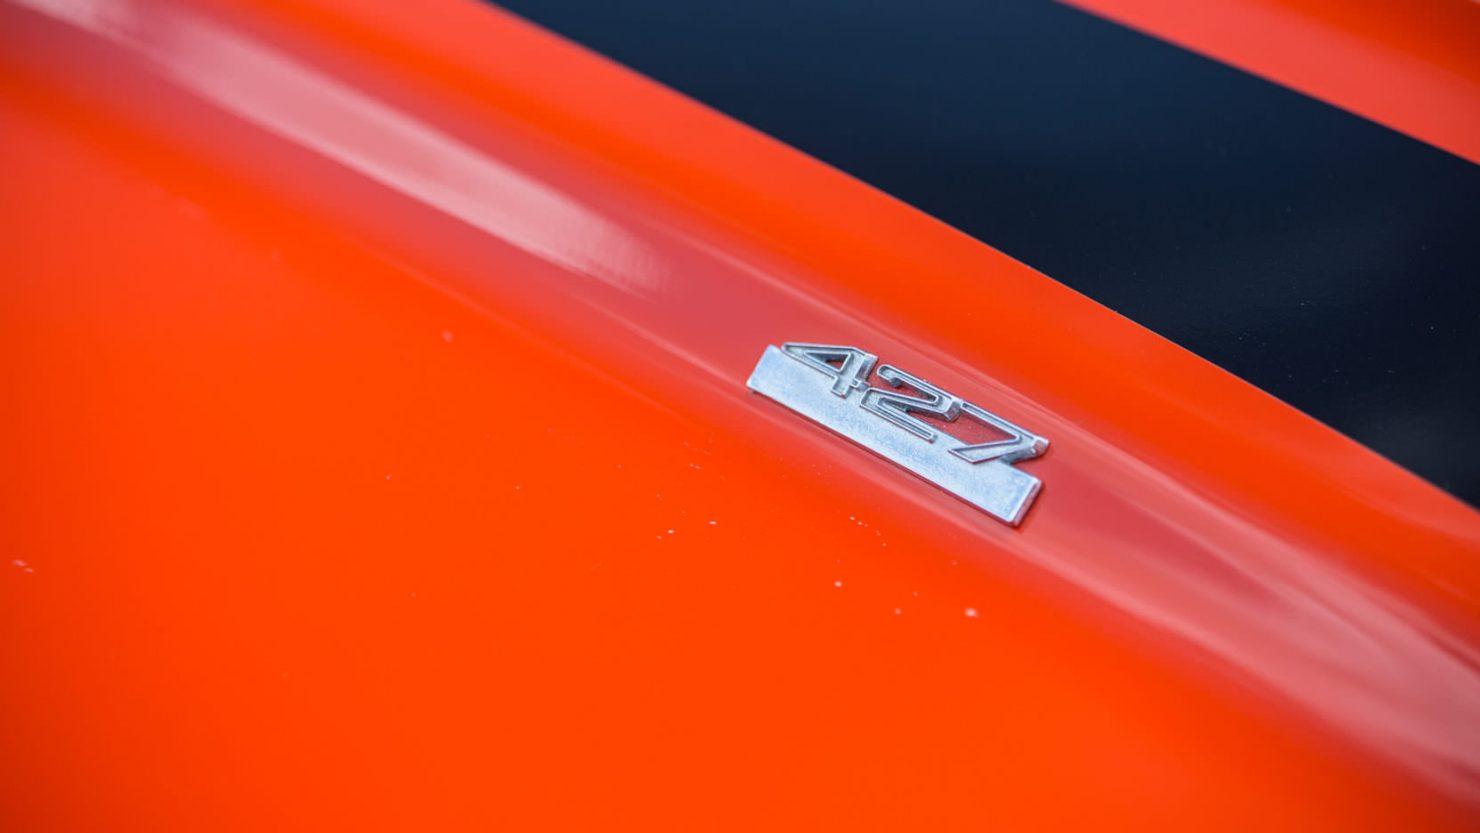 Chevrolet Yenko Camaro 3 1480x833 - 1969 Chevrolet Yenko Camaro